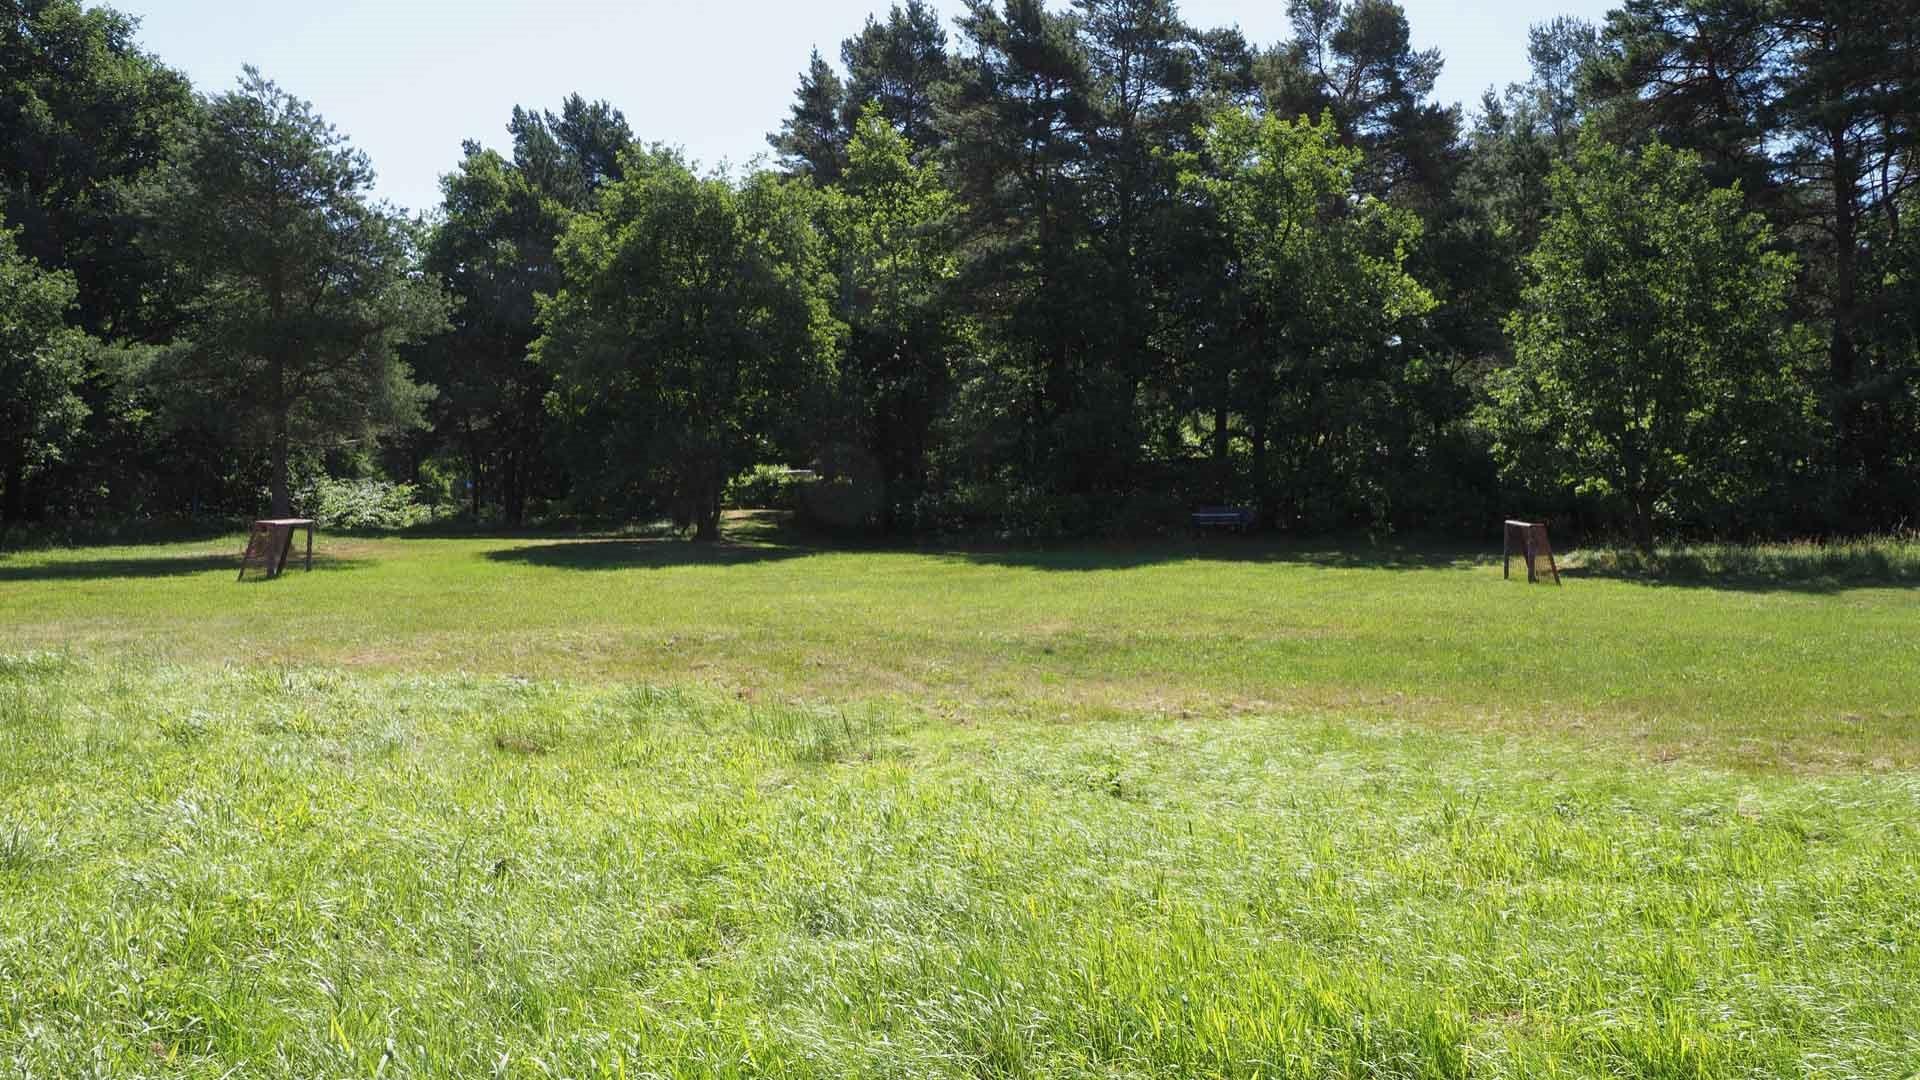 Naturcamping Hambühren, Wiese